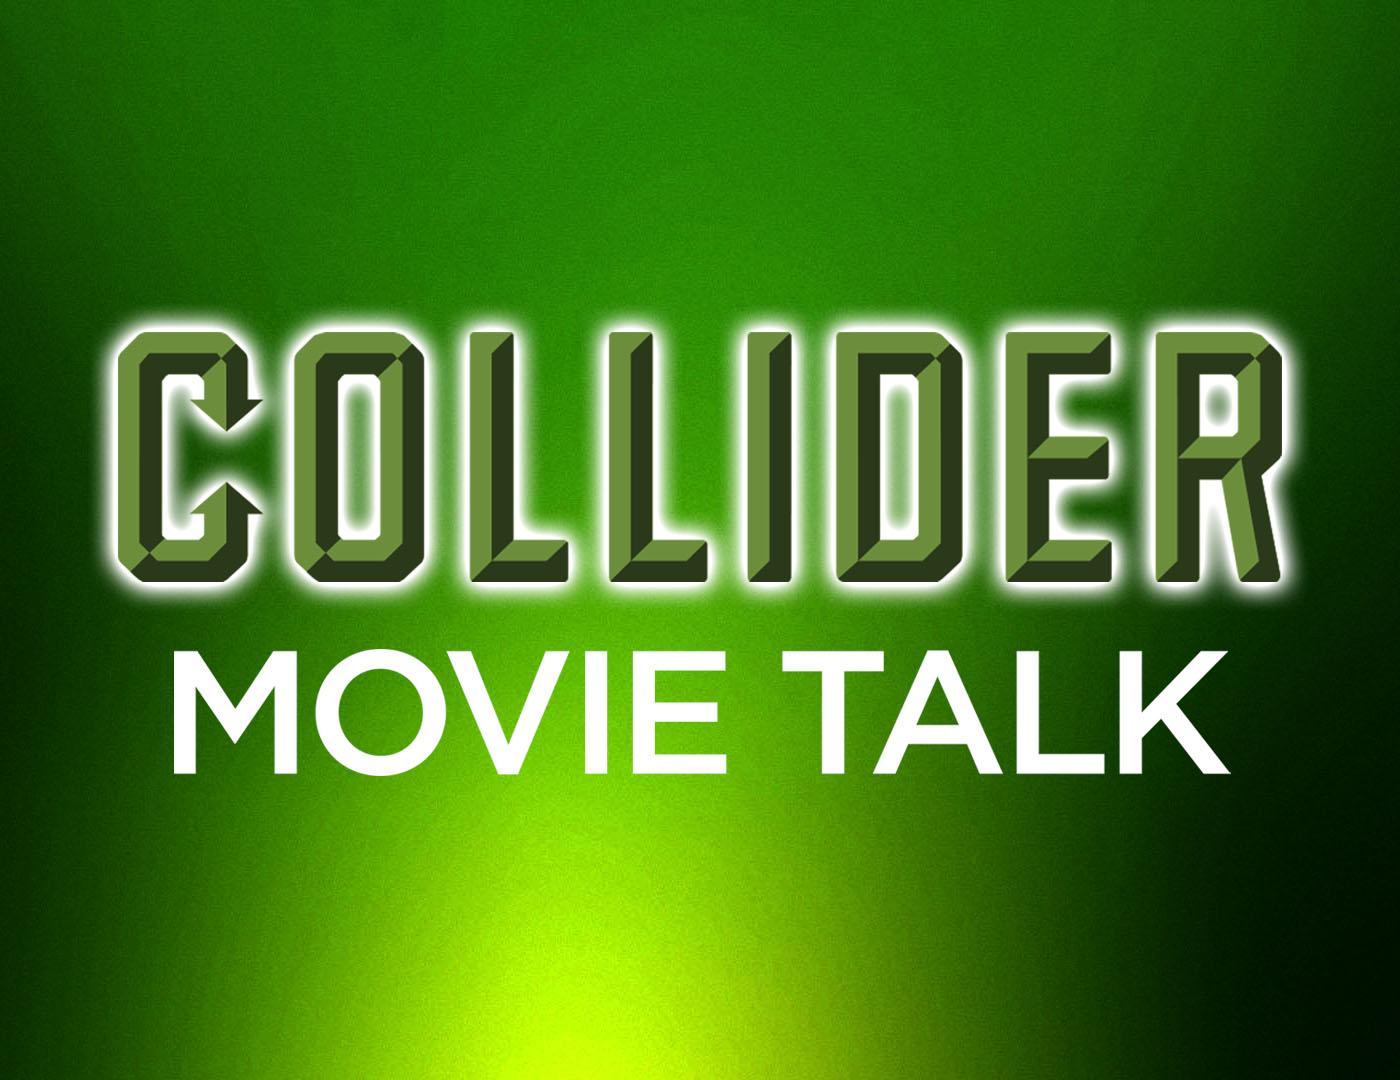 The Batman Starting From Scratch Again - Collider Movie Talk